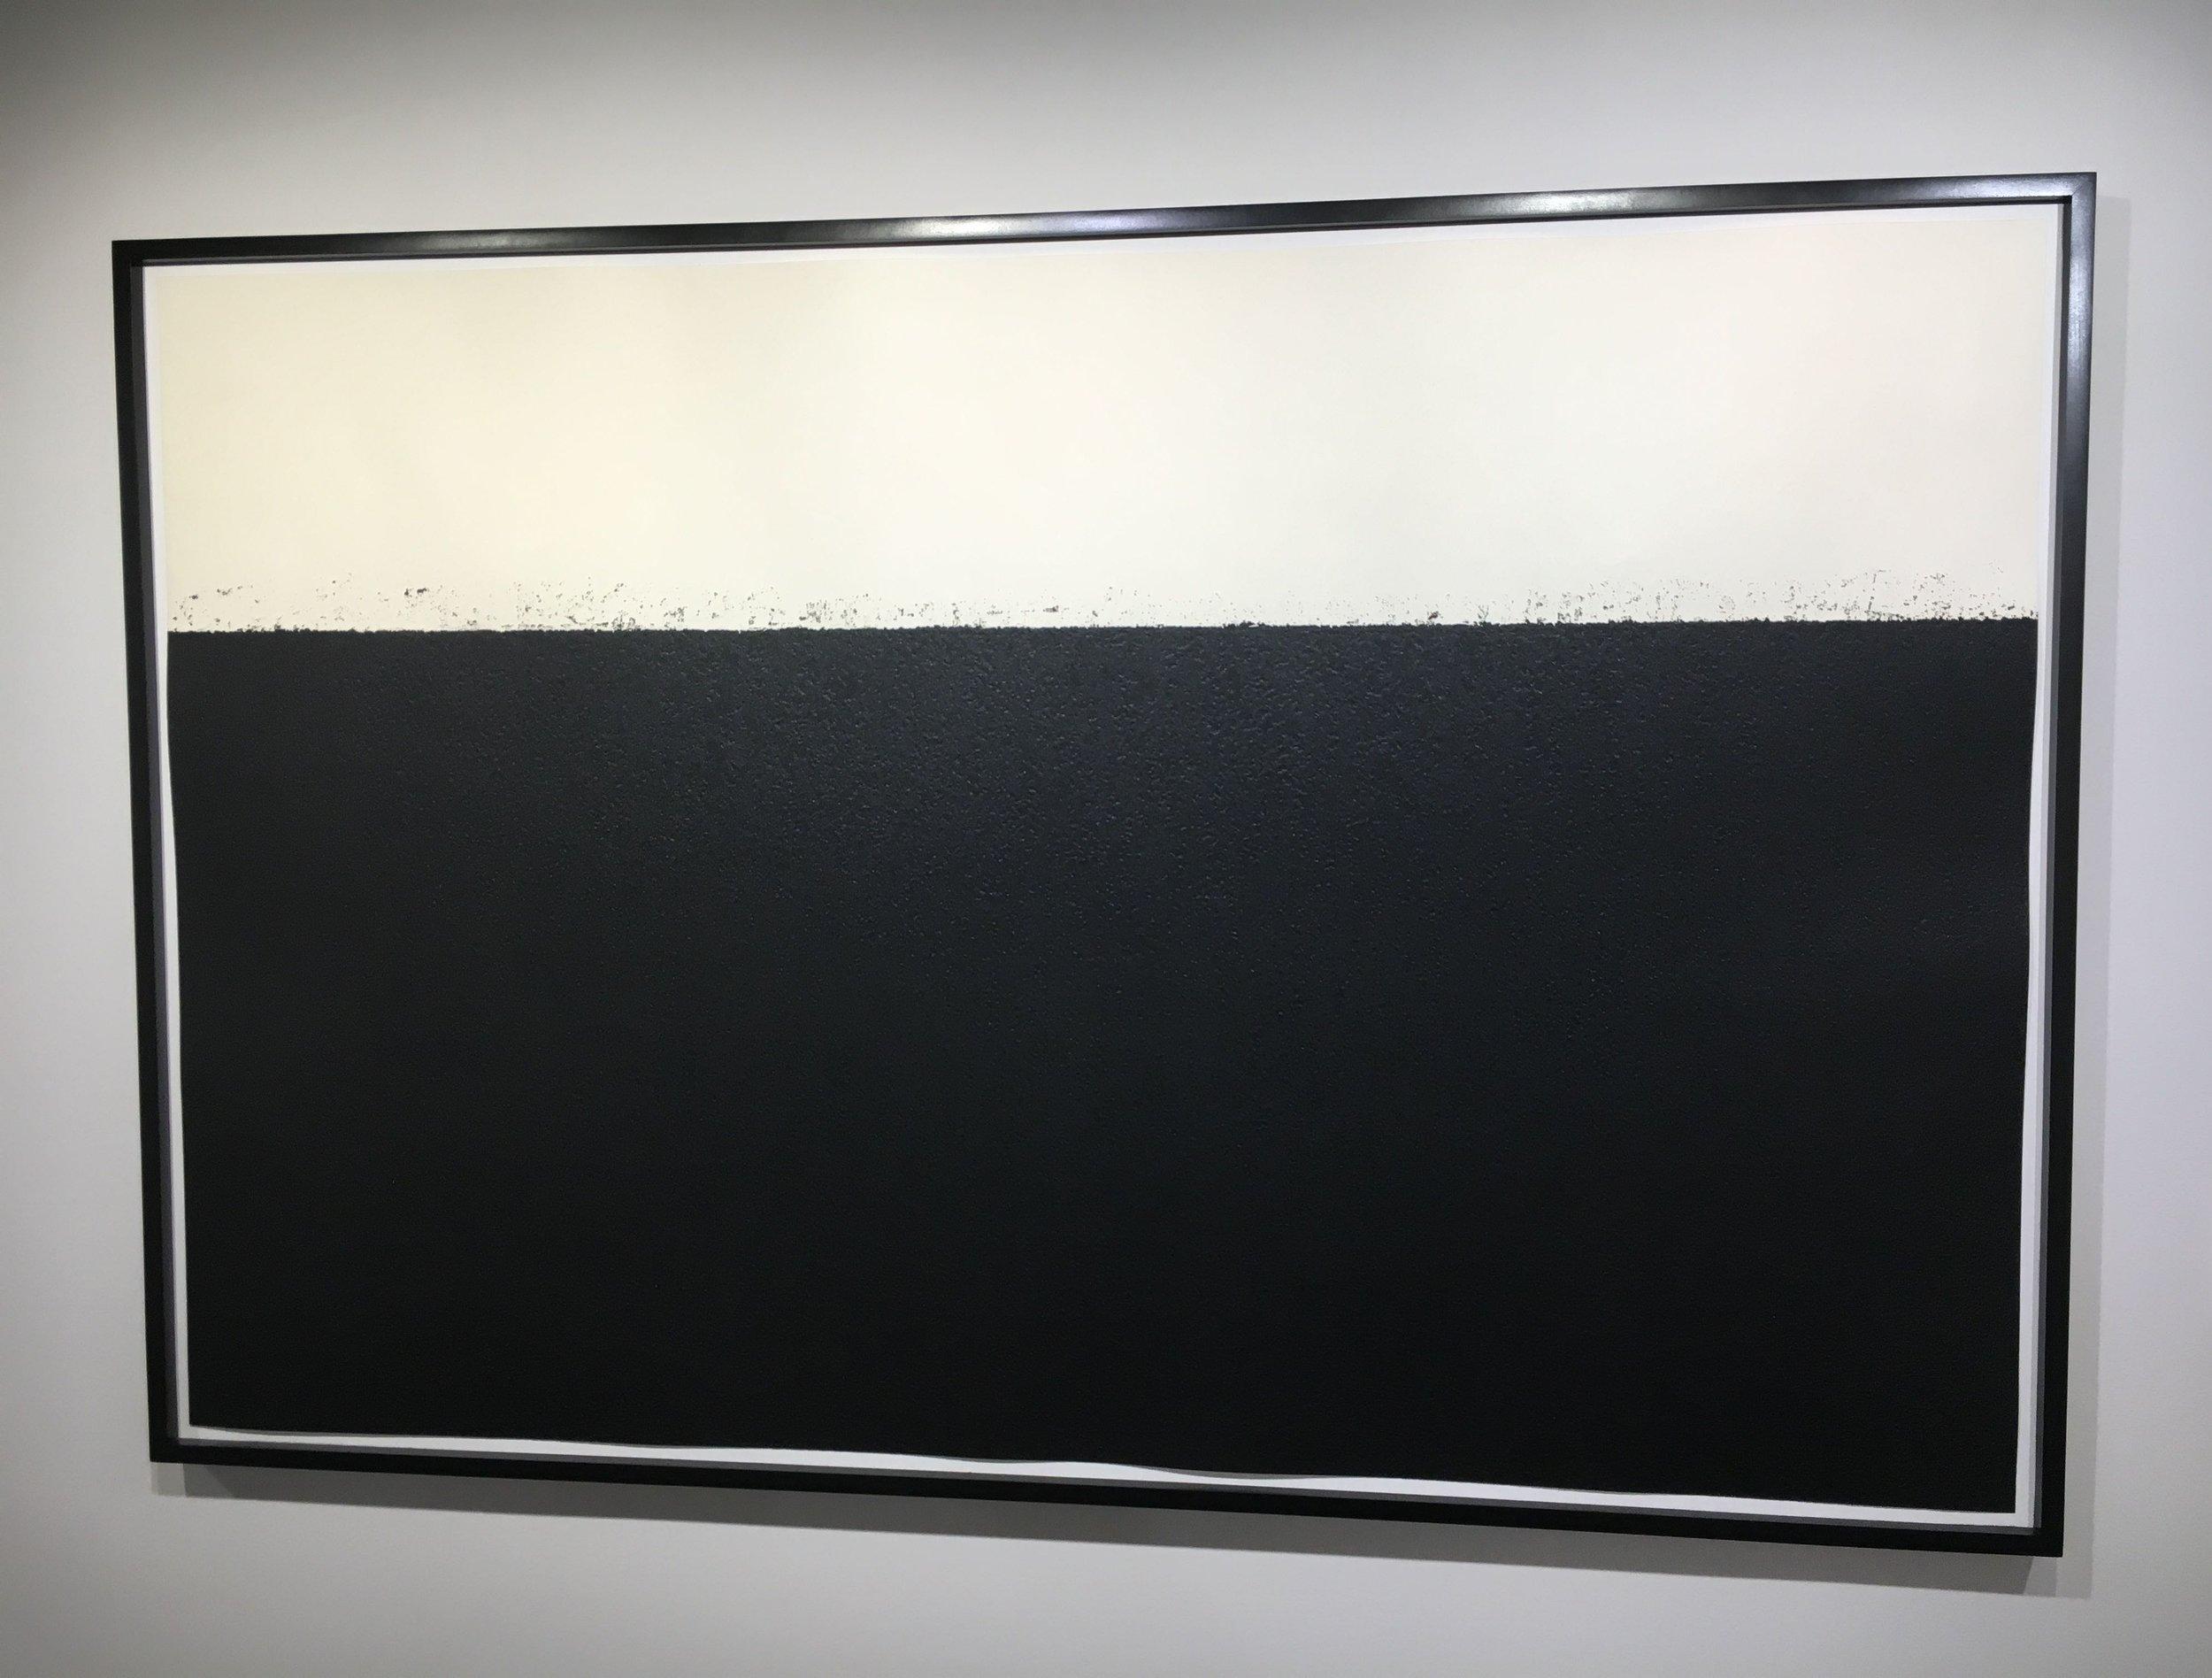 Above:  Level II , 2008, Etching, on Kozo Misumi paper, 46 1/2 x 70 in. (118.1 x 177.8 cm);  Geometric Abstraction: Albers, Burri, Förg, Knoebel, Serra , Upsilon Gallery, New York, 2018. Photo by Caius Filimon.